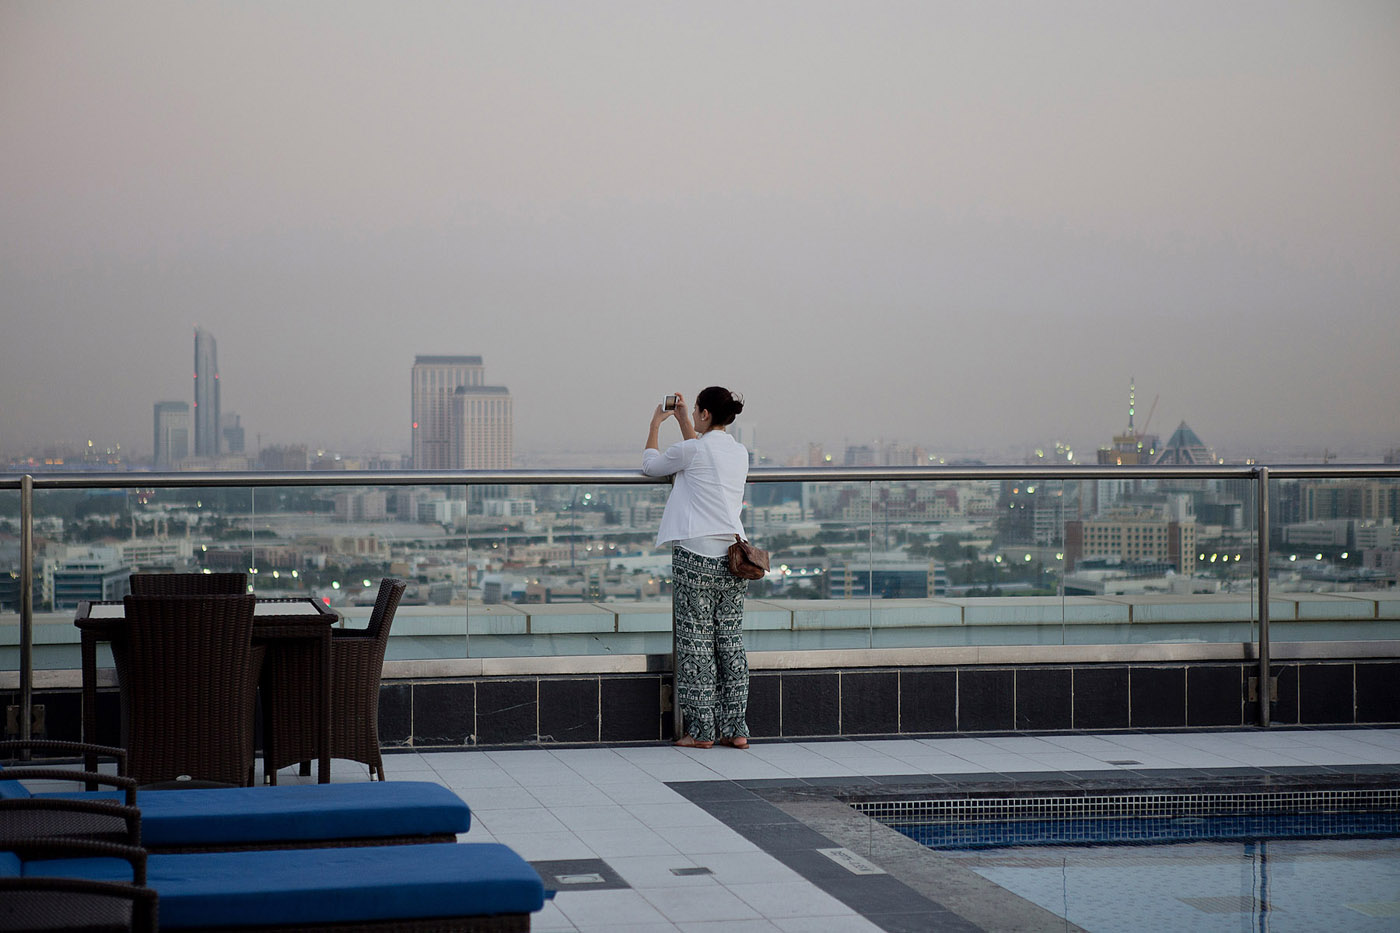 park regis kris kin hotel dubai _ dubai hotels